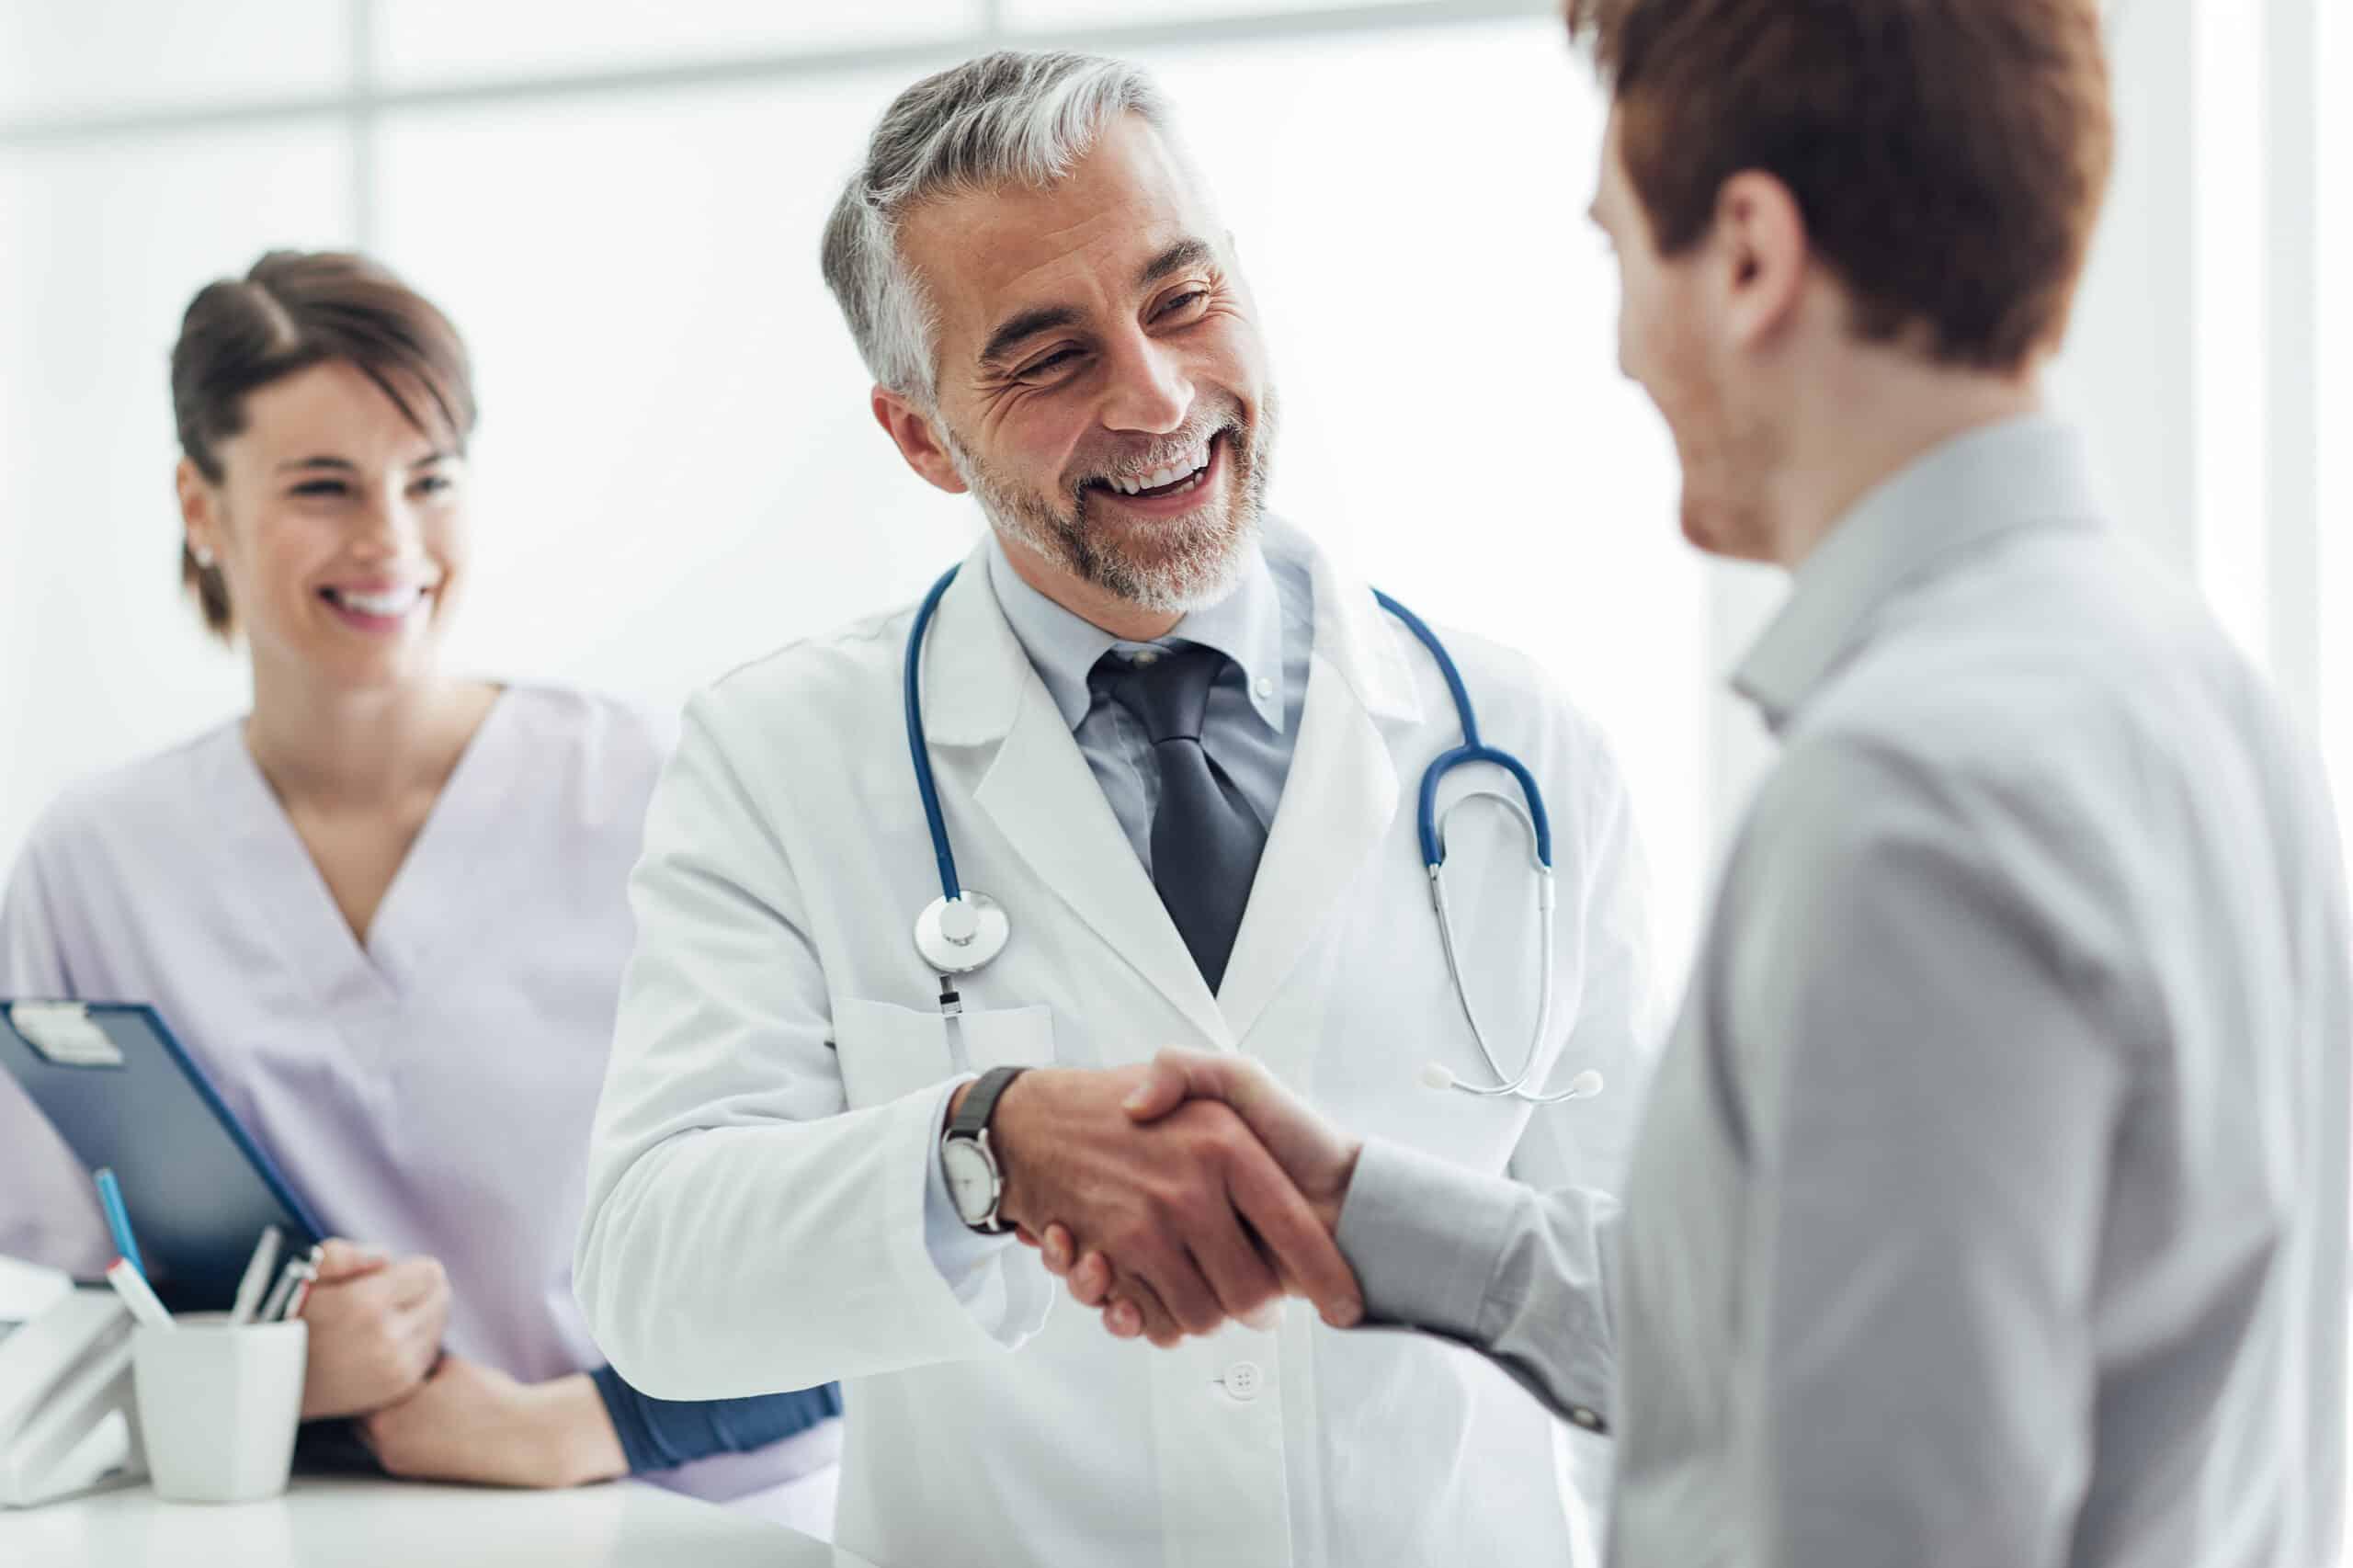 Doctor Patient Consult